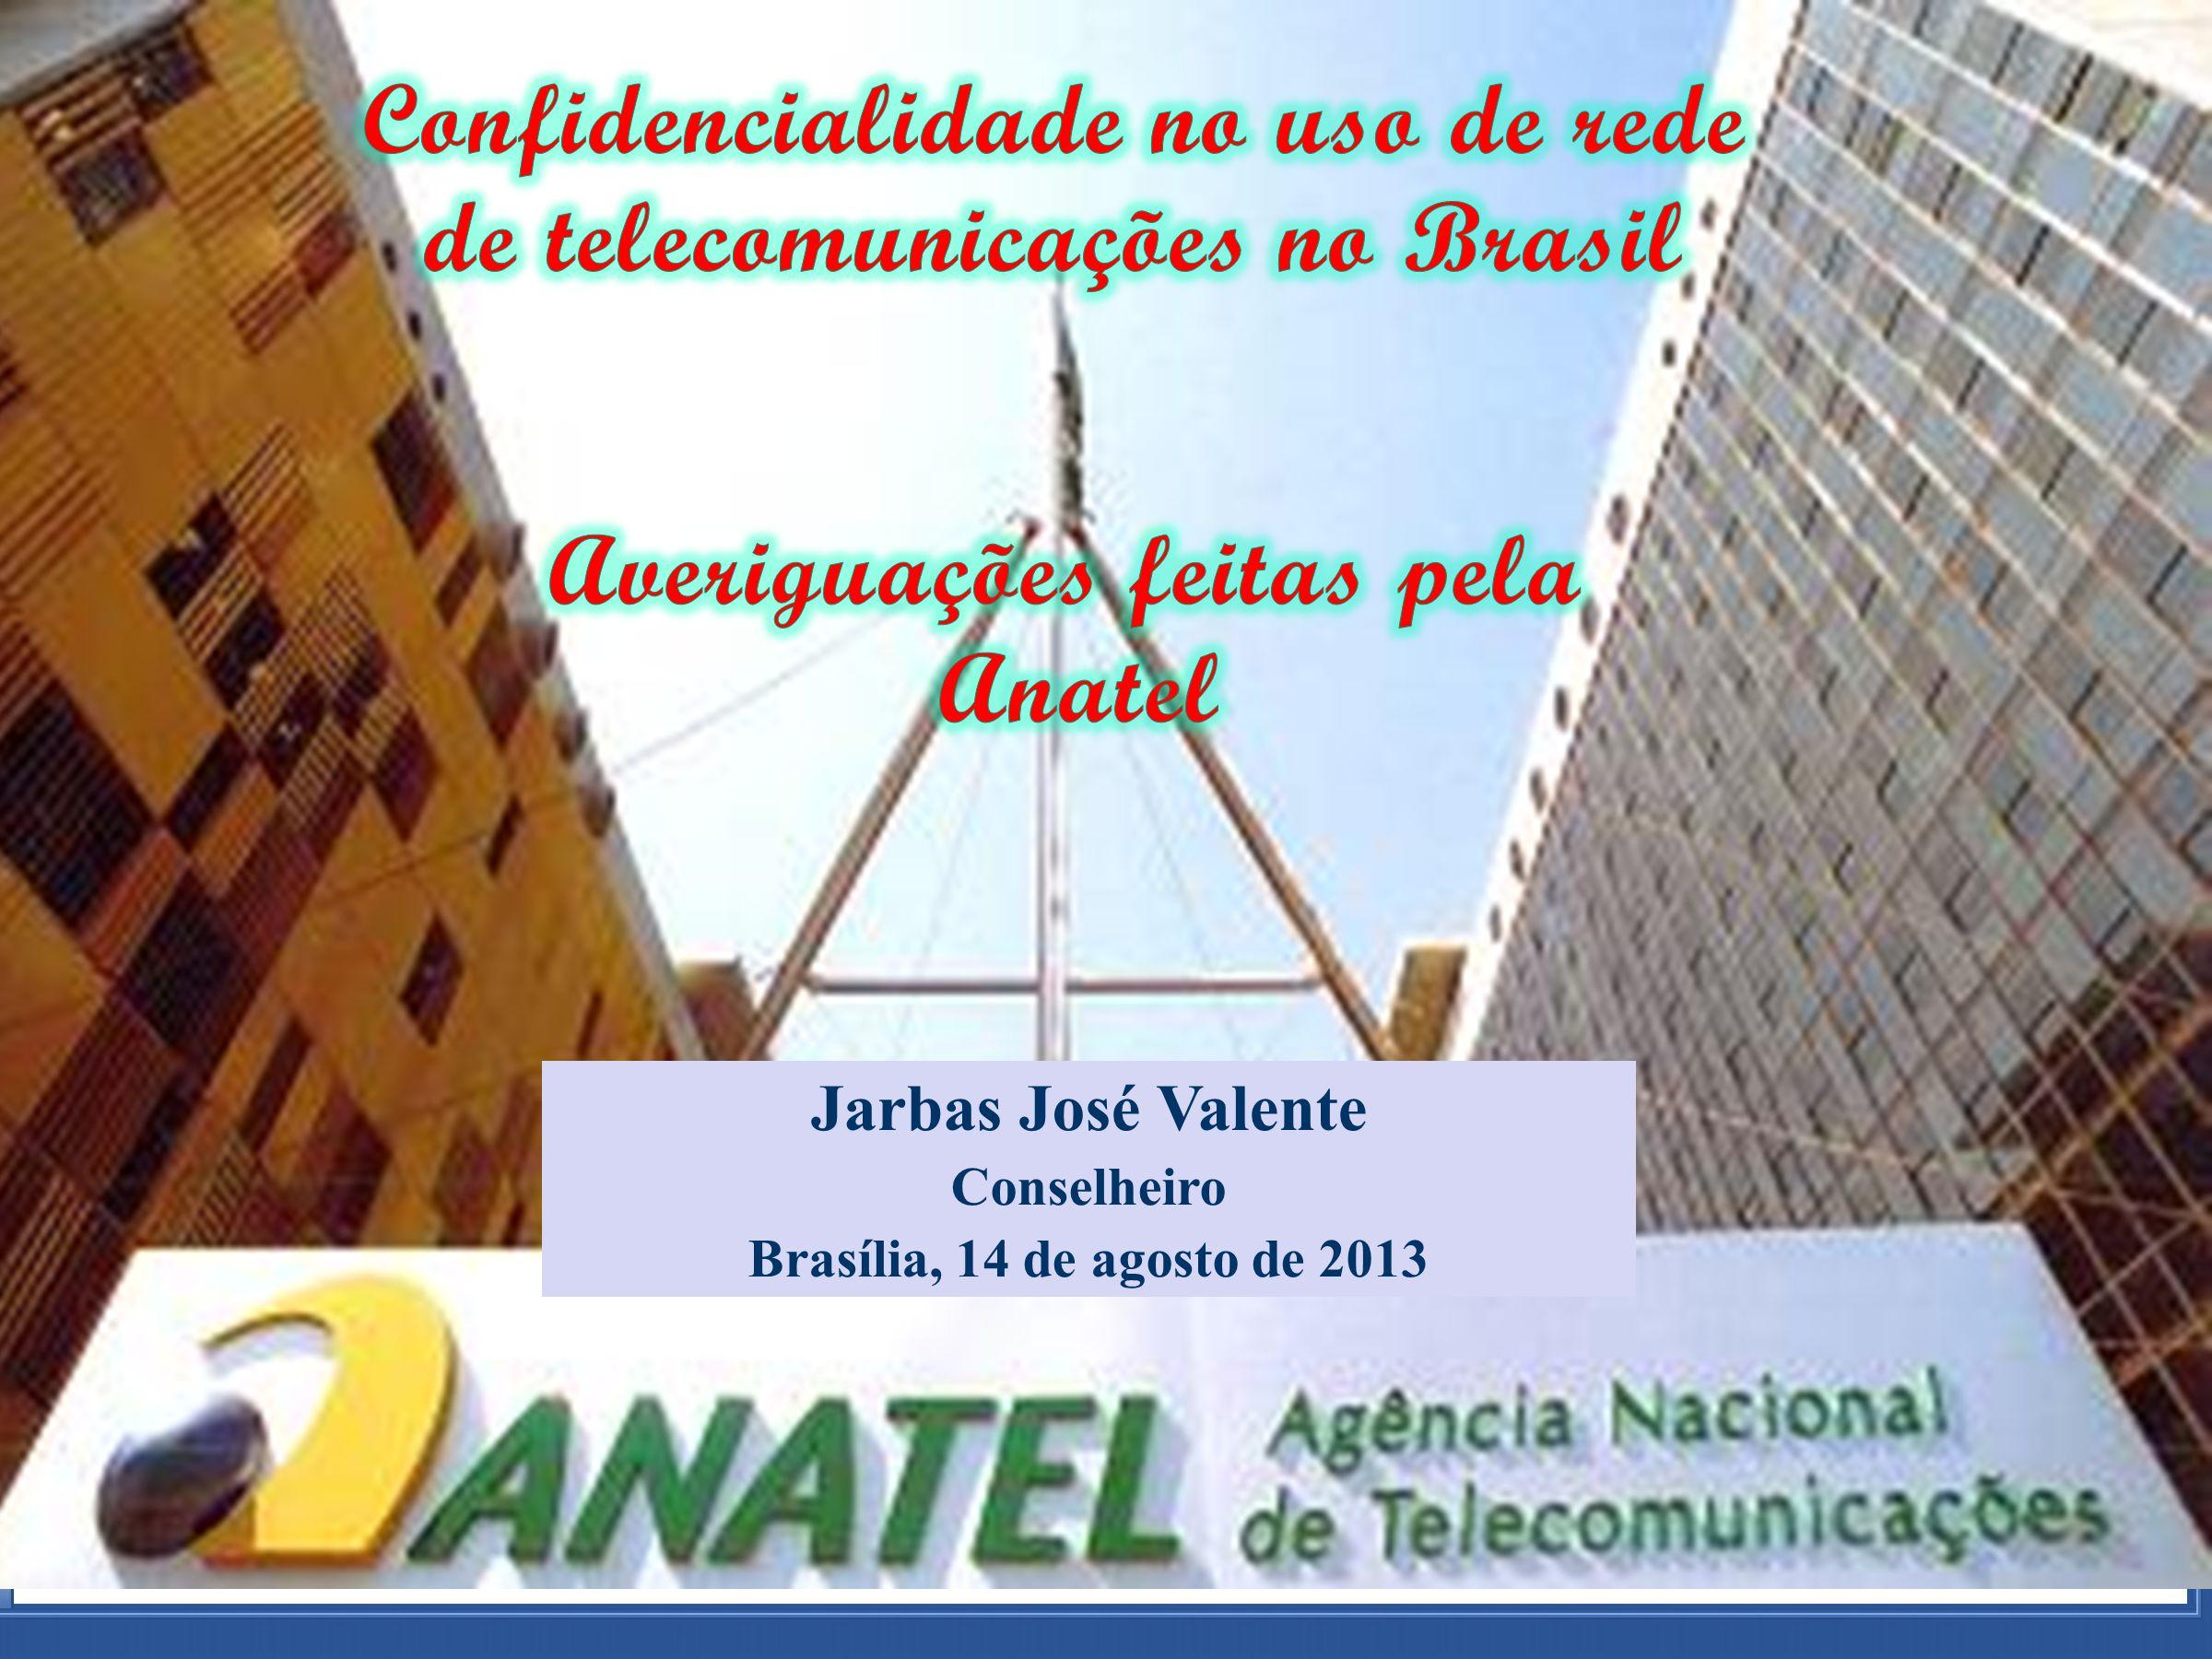 ADTOD Parte Processual Jarbas José Valente Conselheiro Brasília, 14 de agosto de 2013